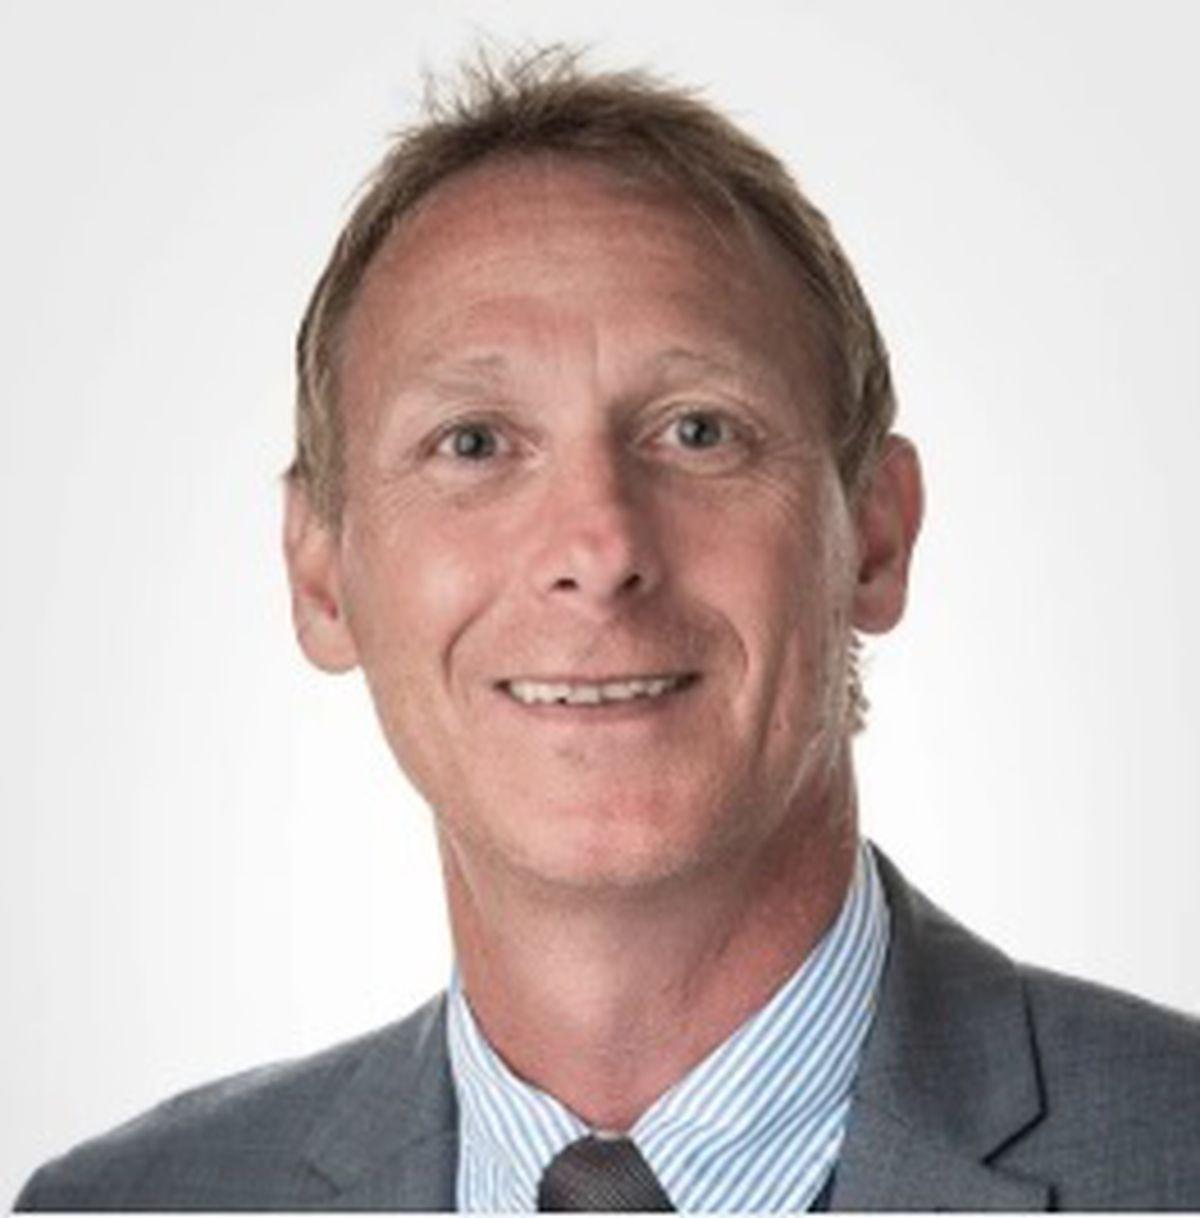 Ian Halstead of Powys County Council's internal auditors SWAP